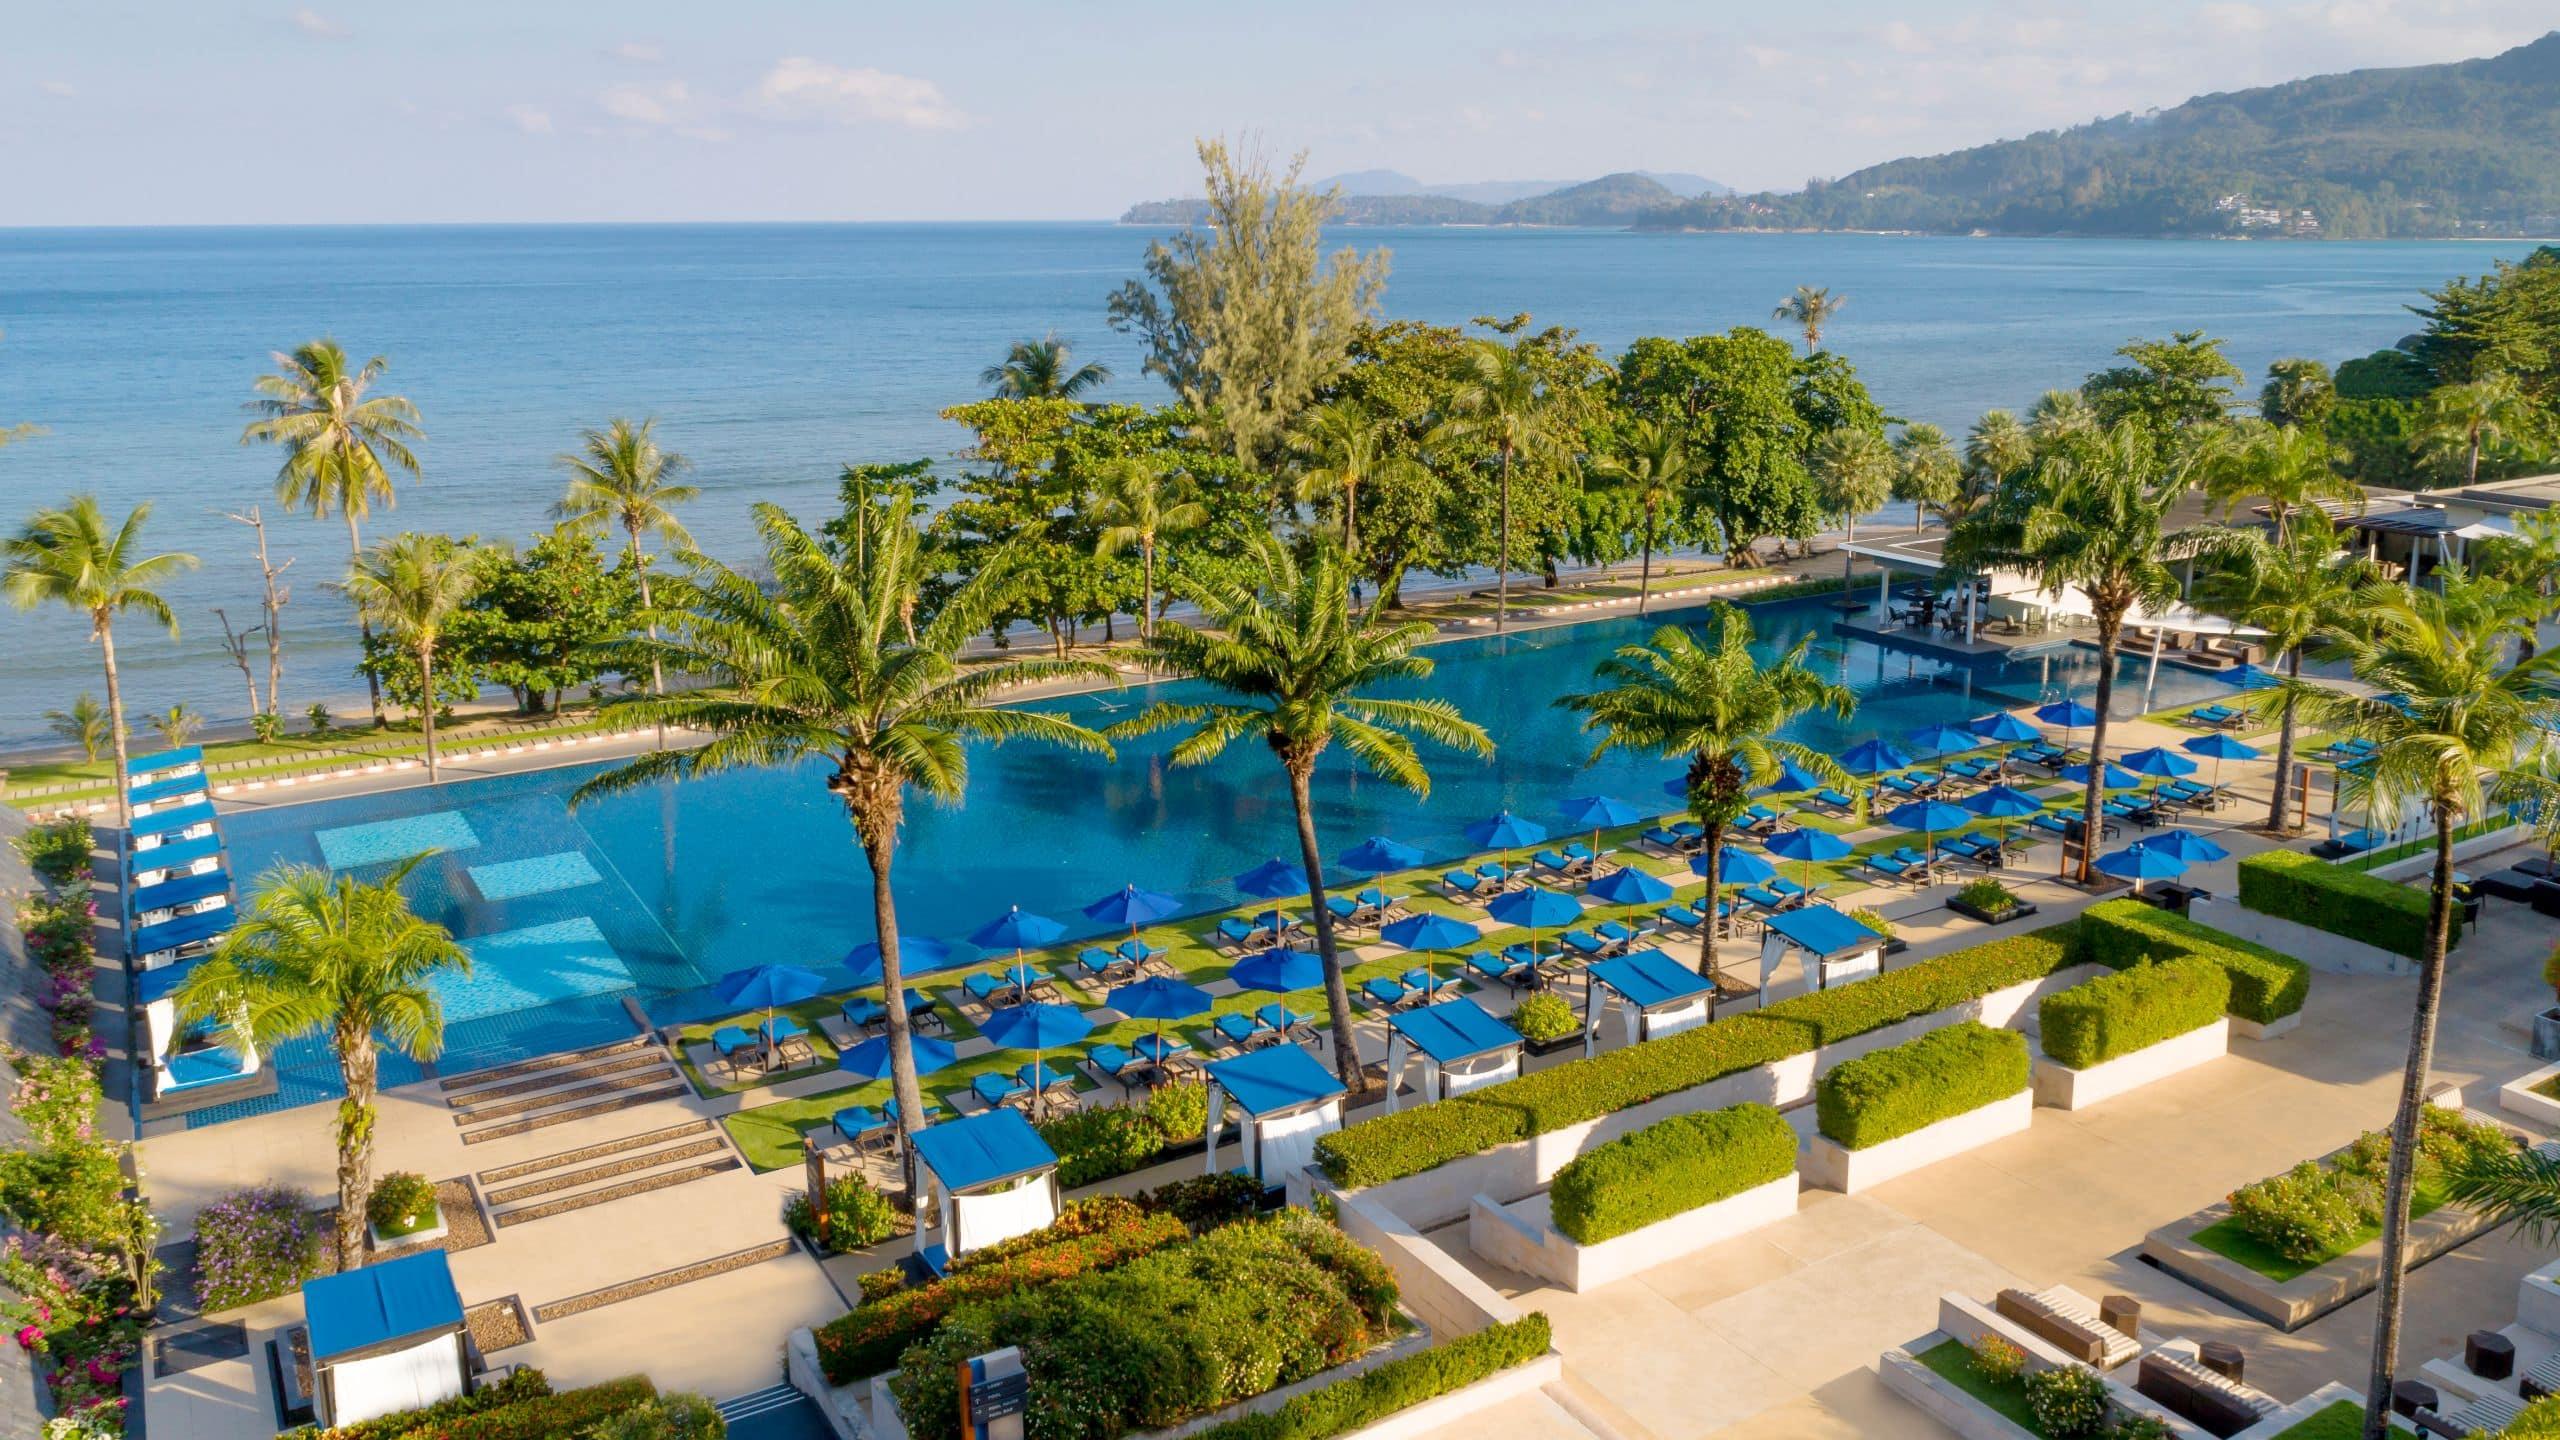 5-Star Phuket Hotel in Kamala Beach | Hyatt Regency Phuket Resort